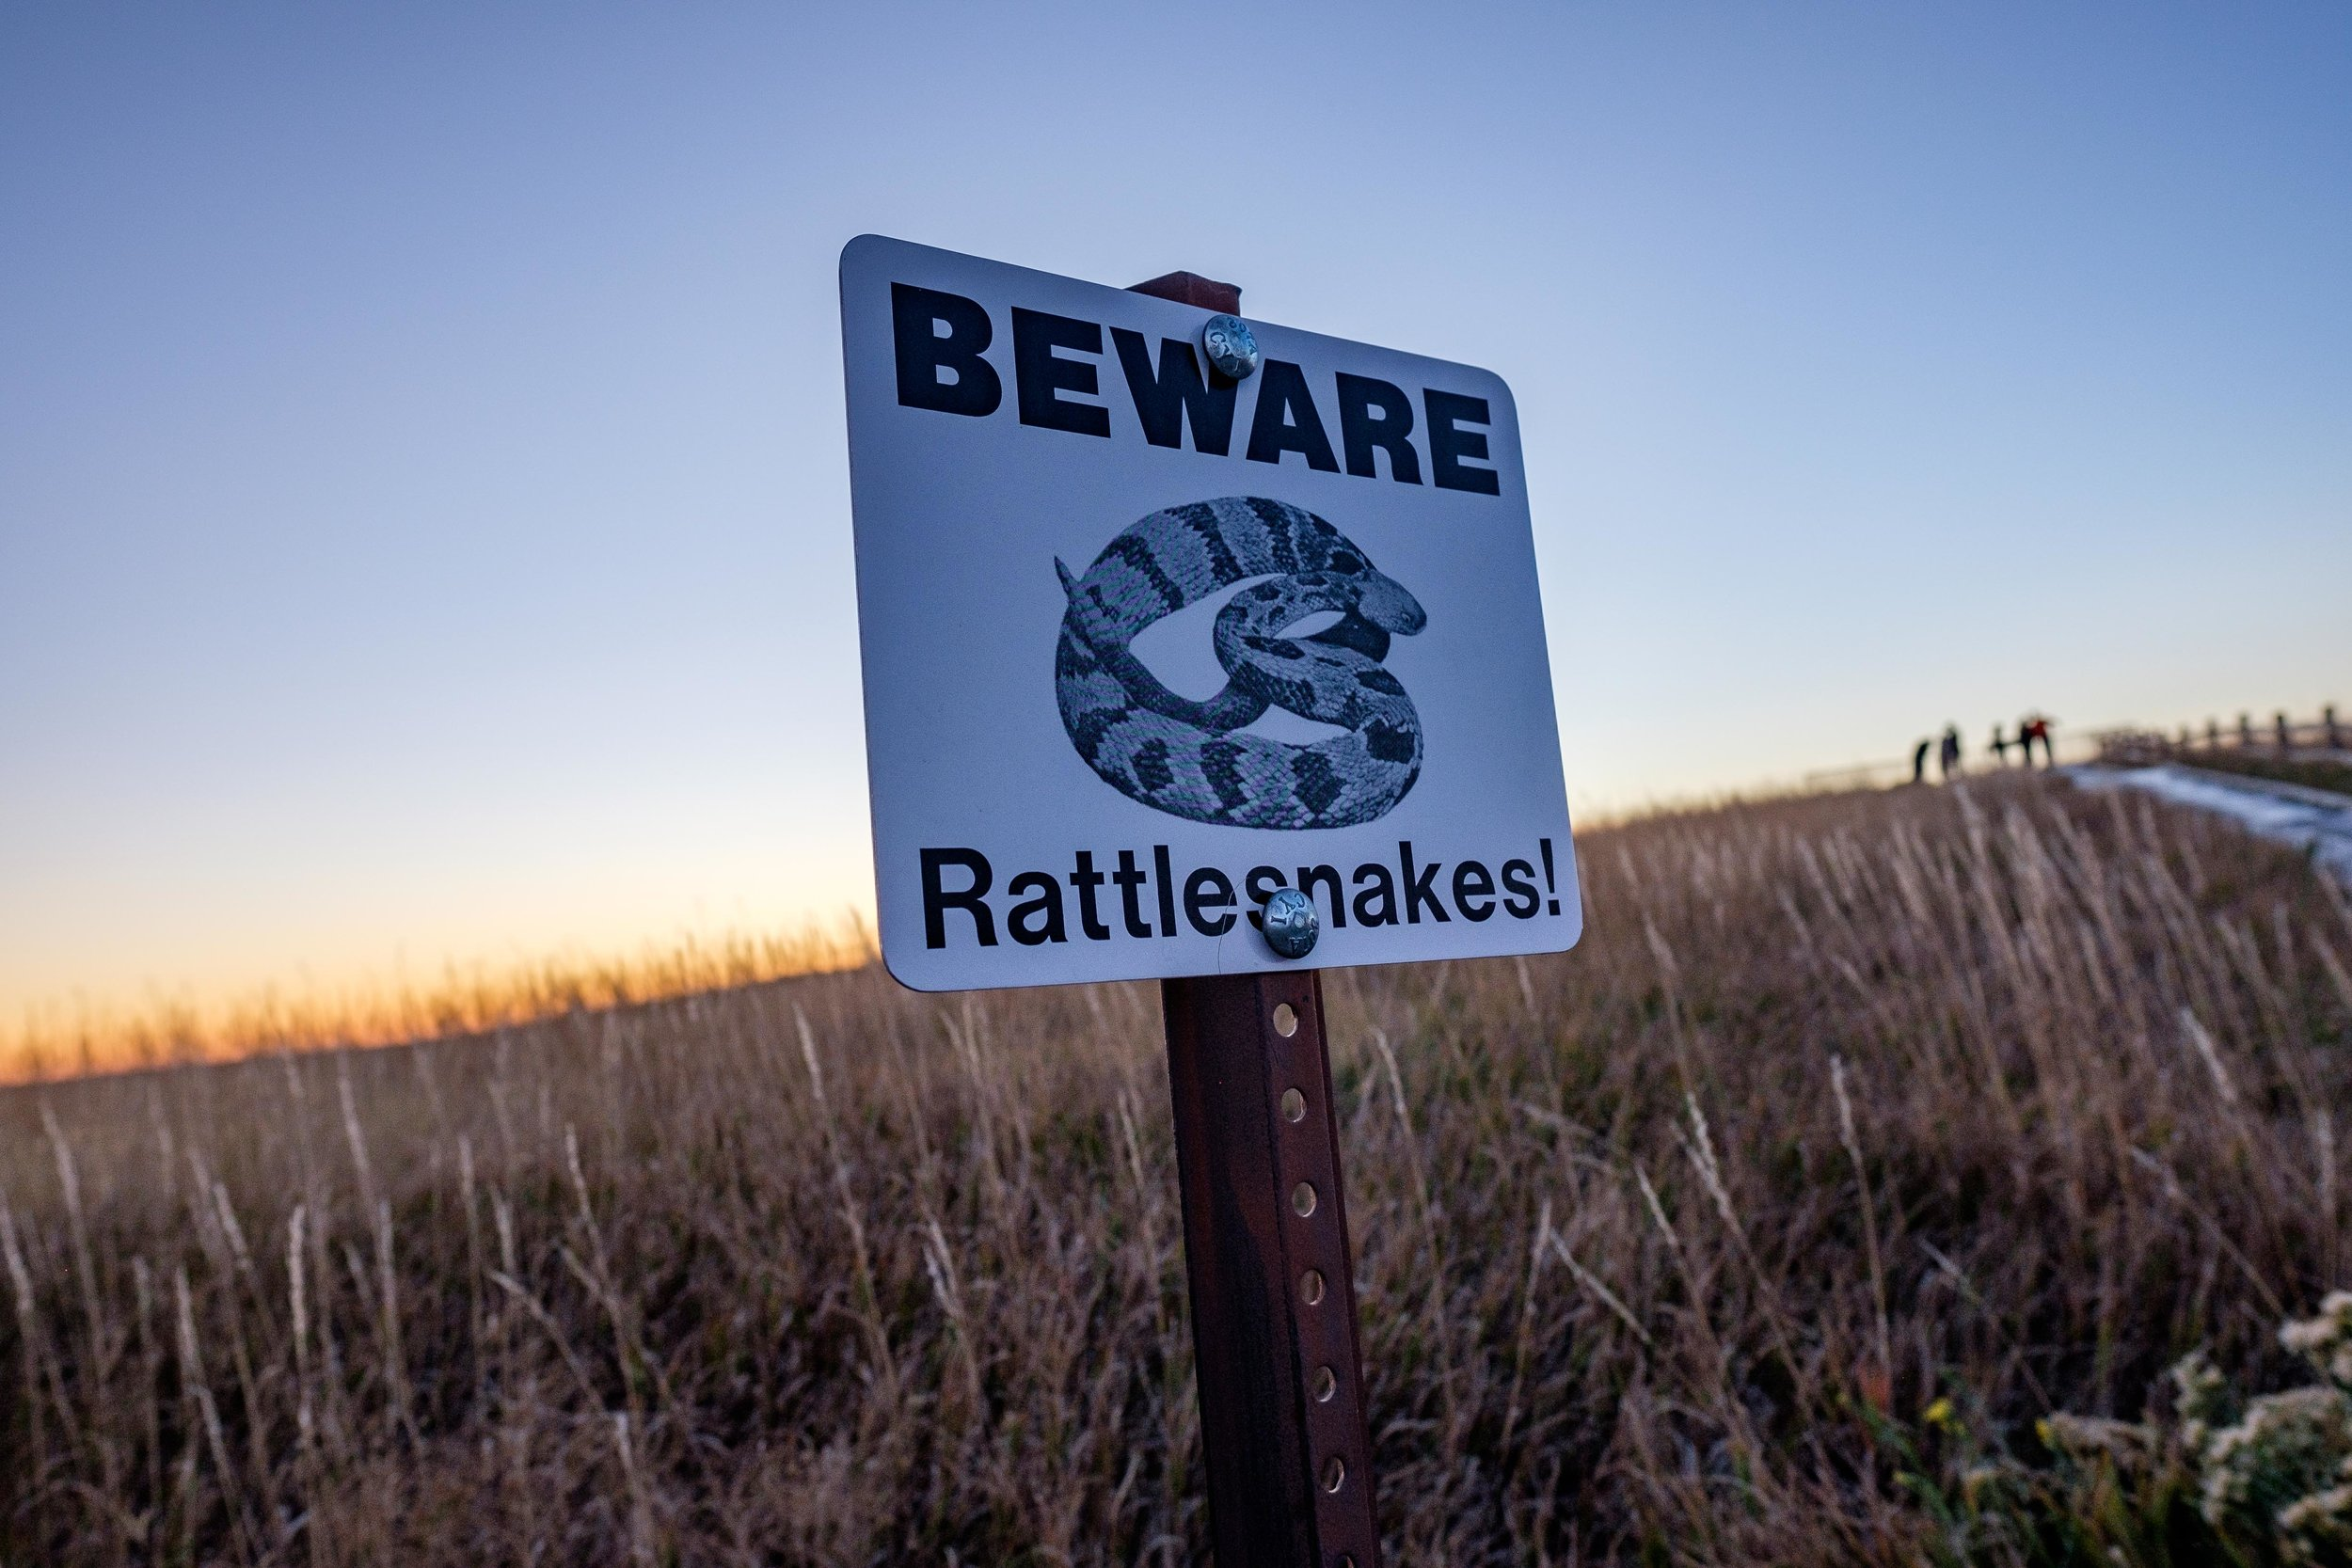 Beware of prairie rattlesnakes in Badlands National Park in South Dakota.